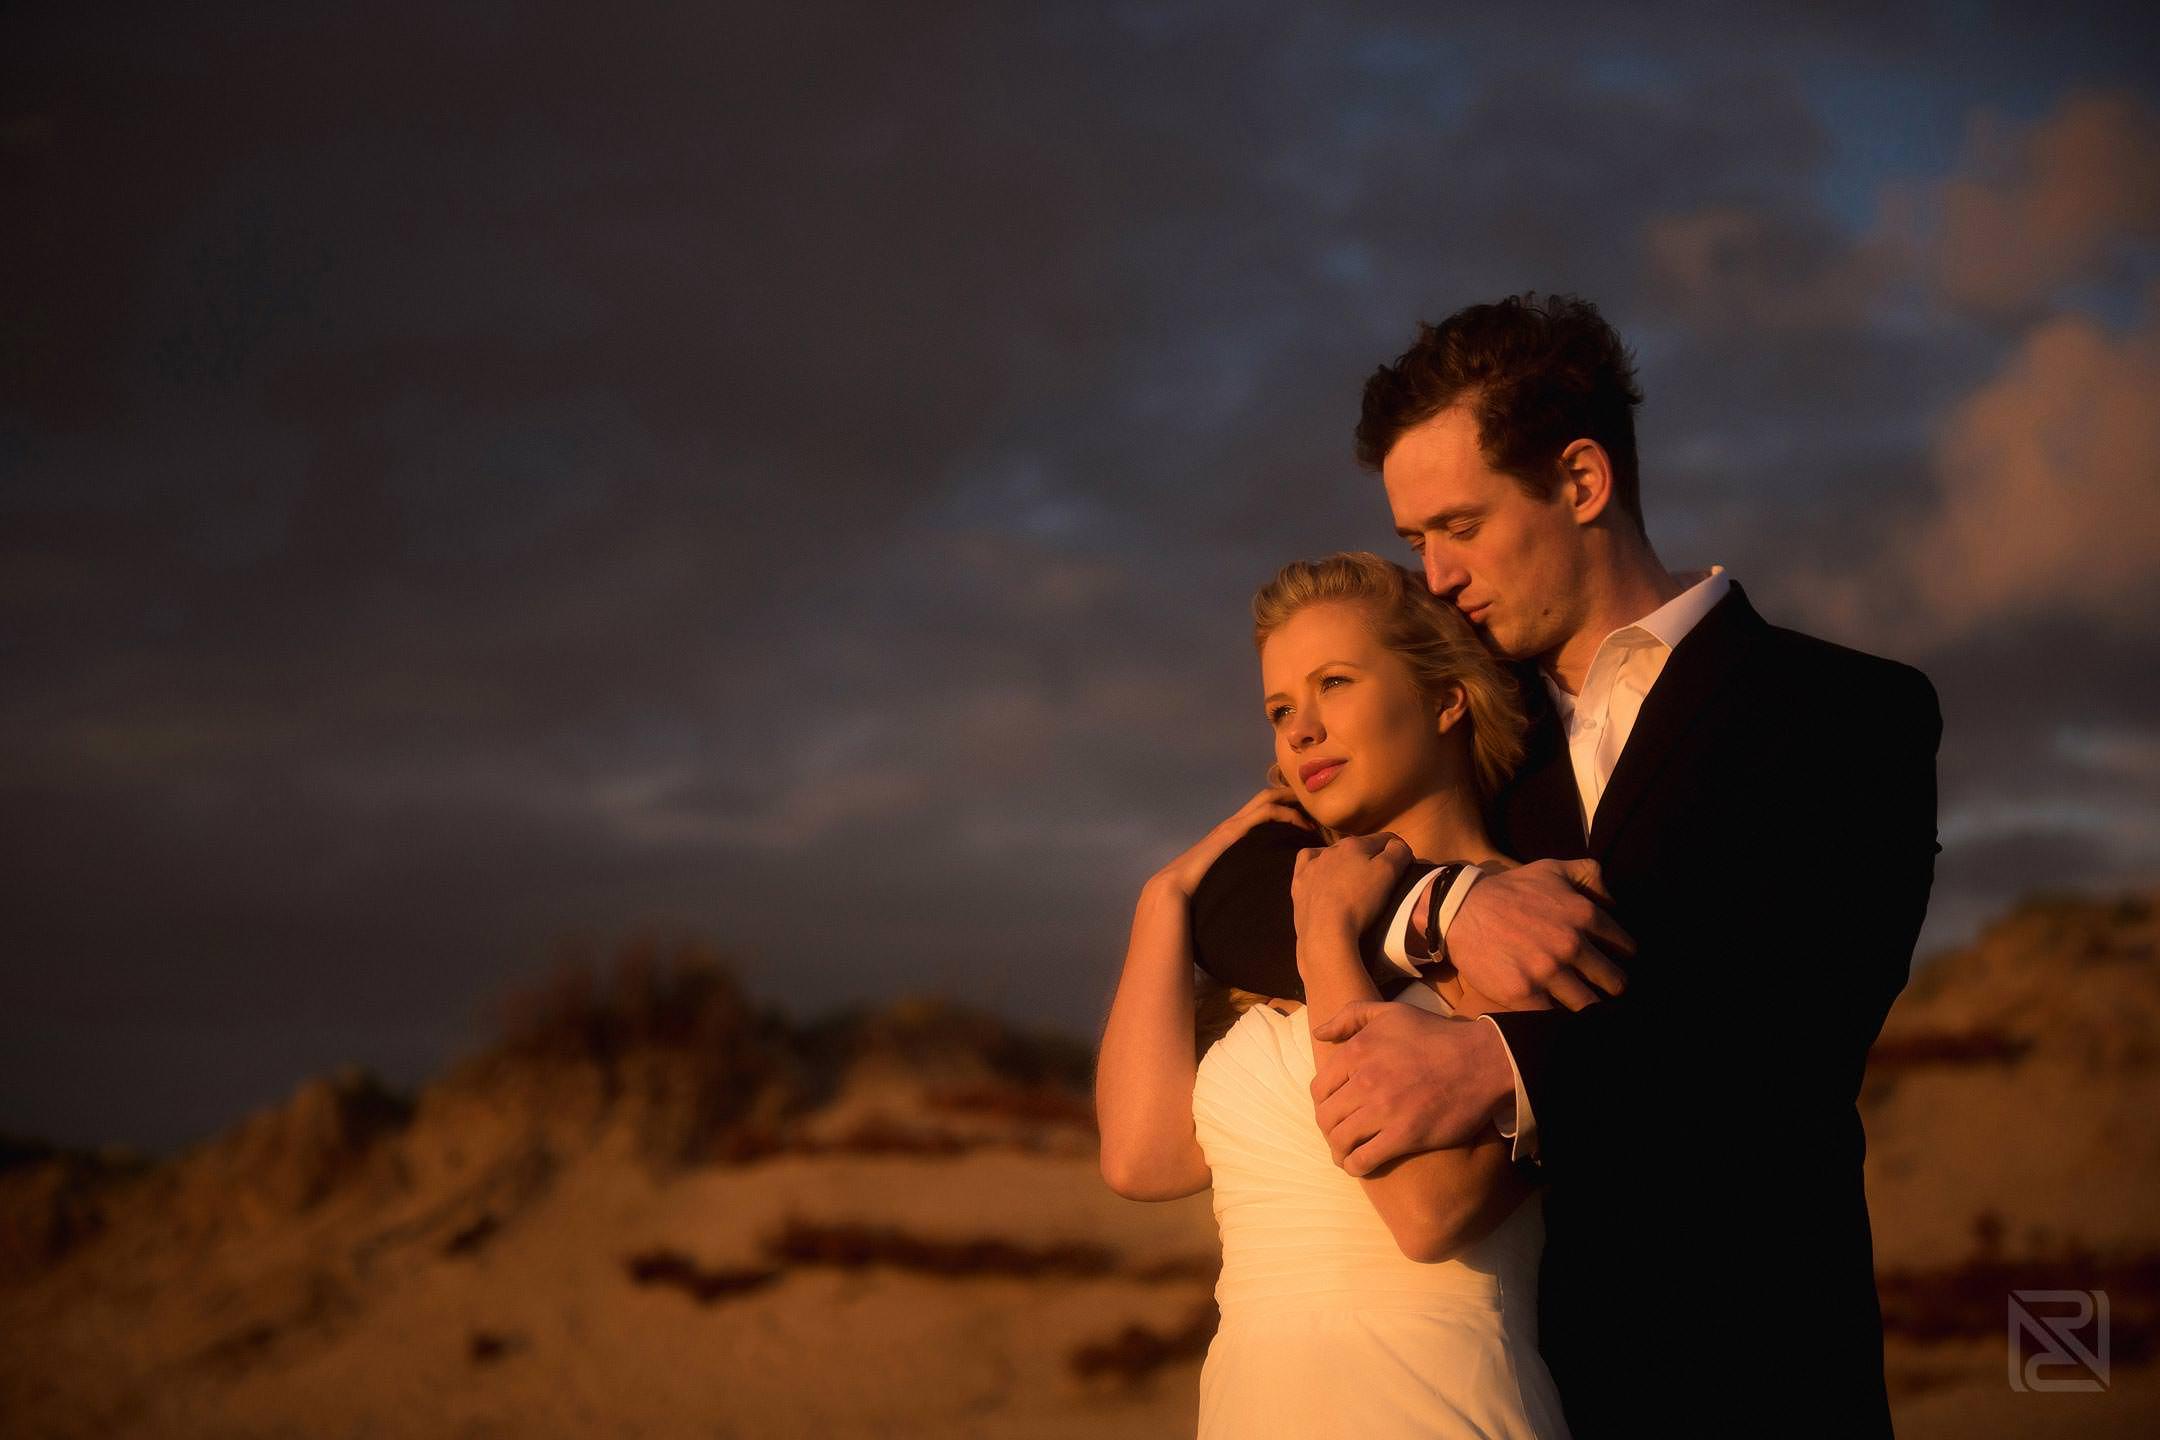 best-wedding-photographs-2015-038